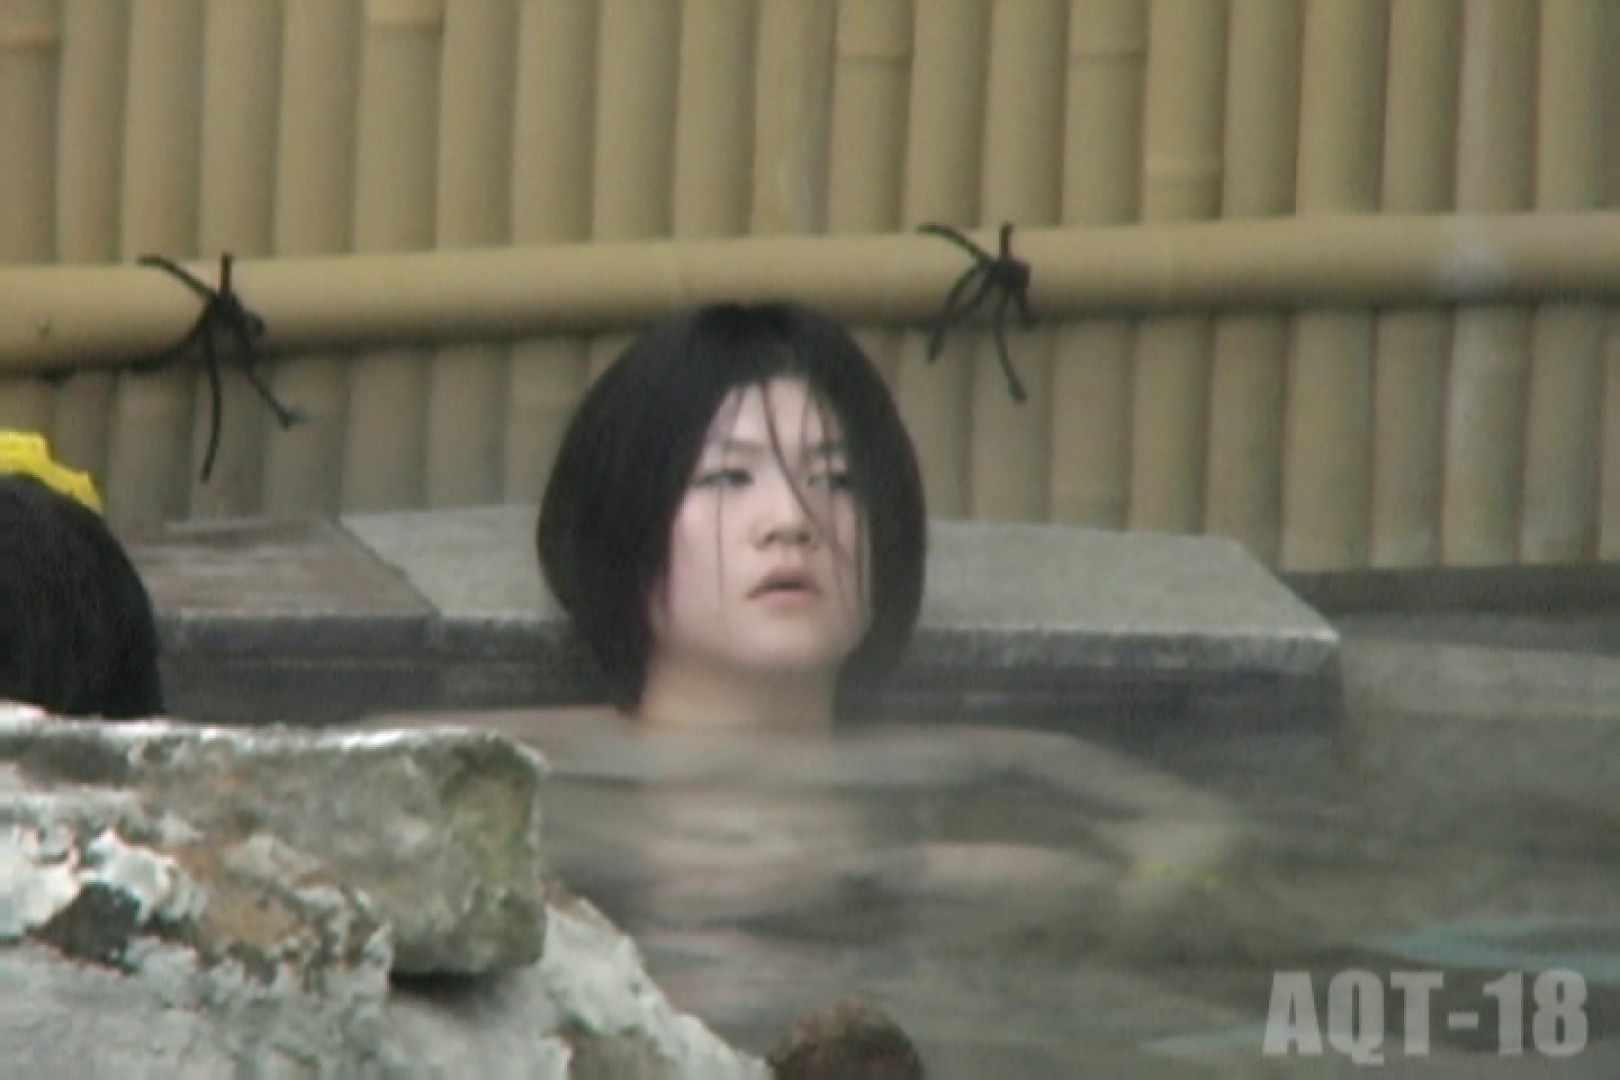 Aquaな露天風呂Vol.859 露天風呂編 | 盗撮シリーズ  76PIX 17